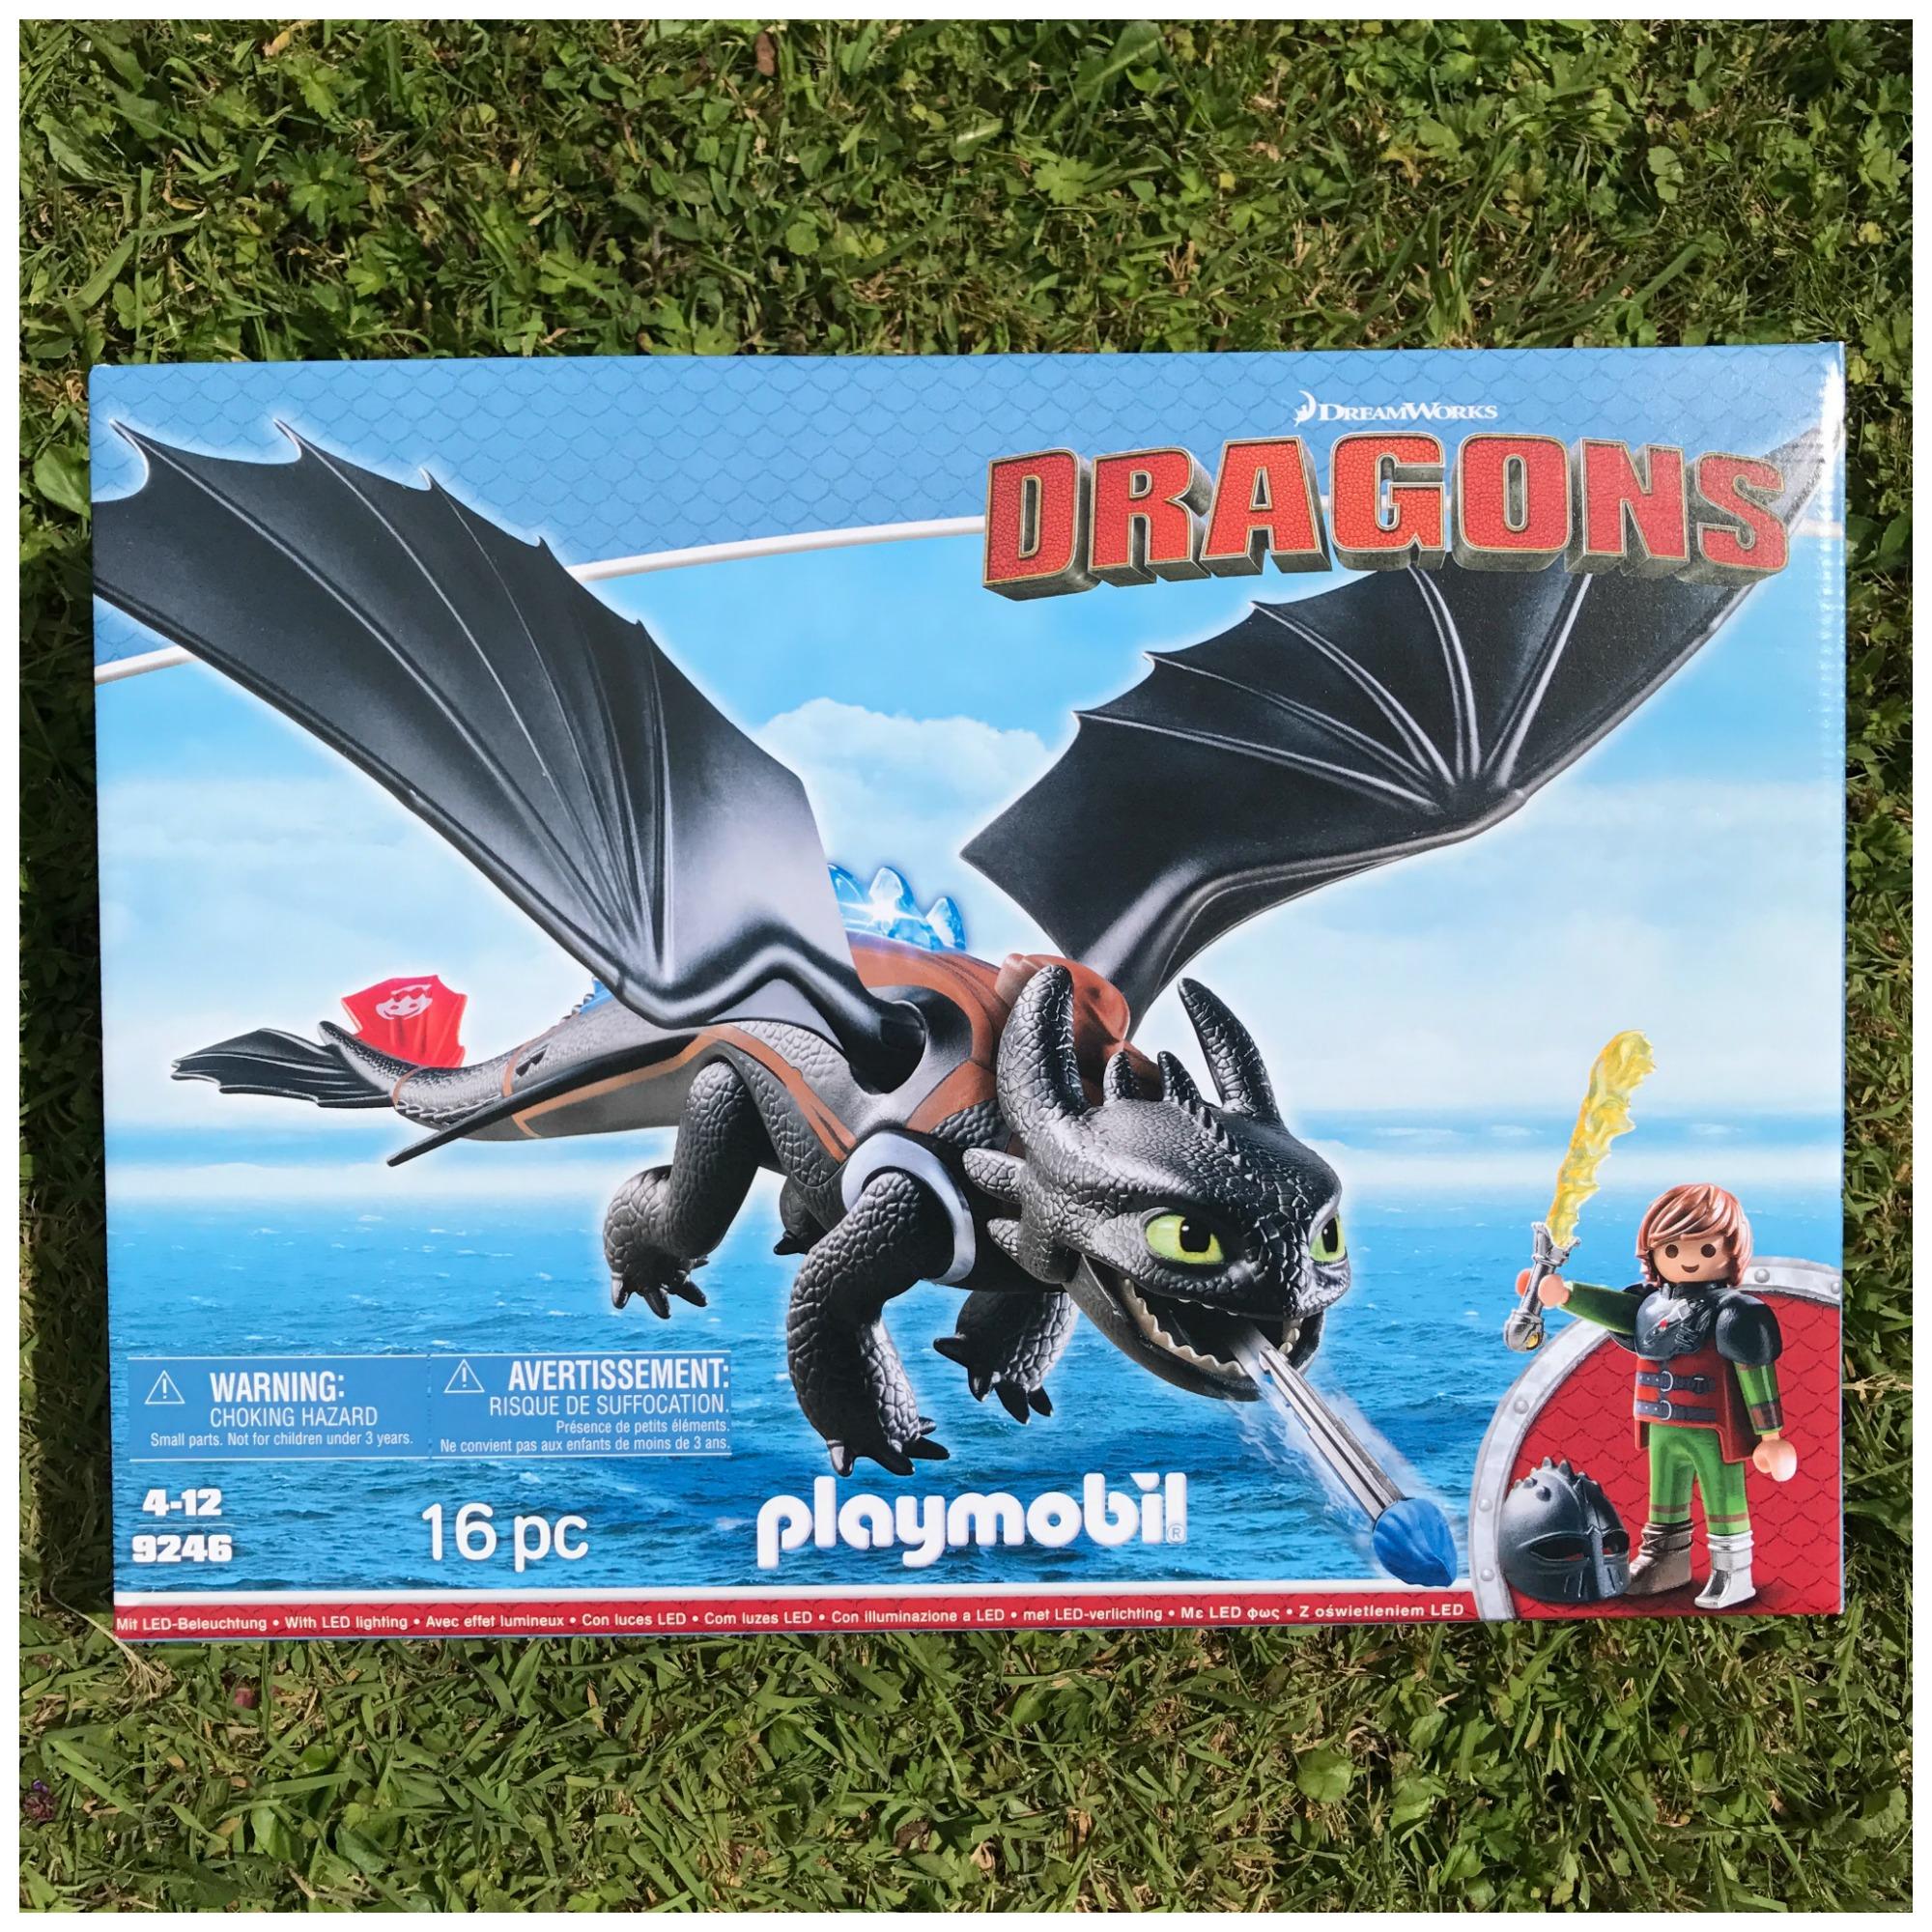 Dragon playmobil pile